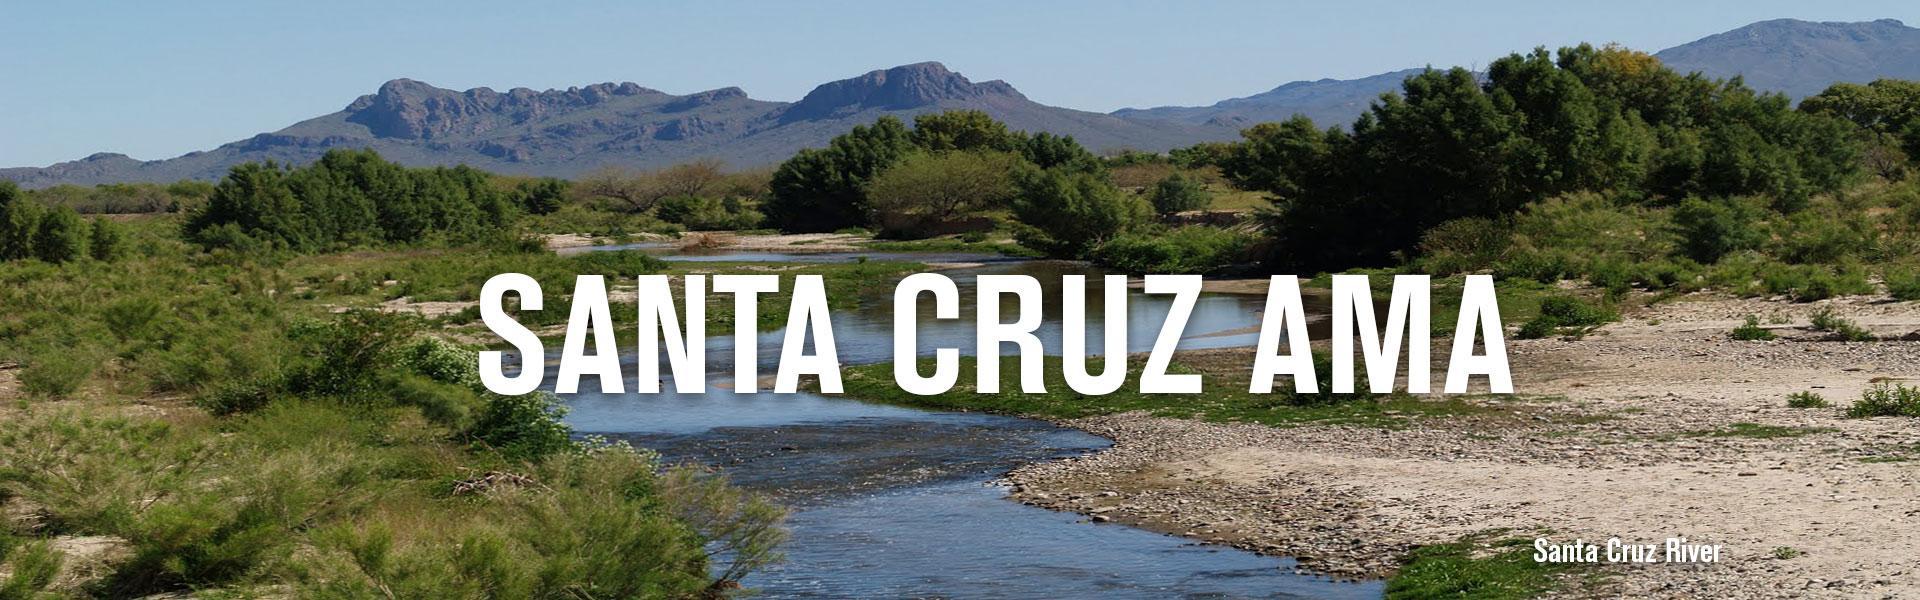 Santa Cruz Active Management Area